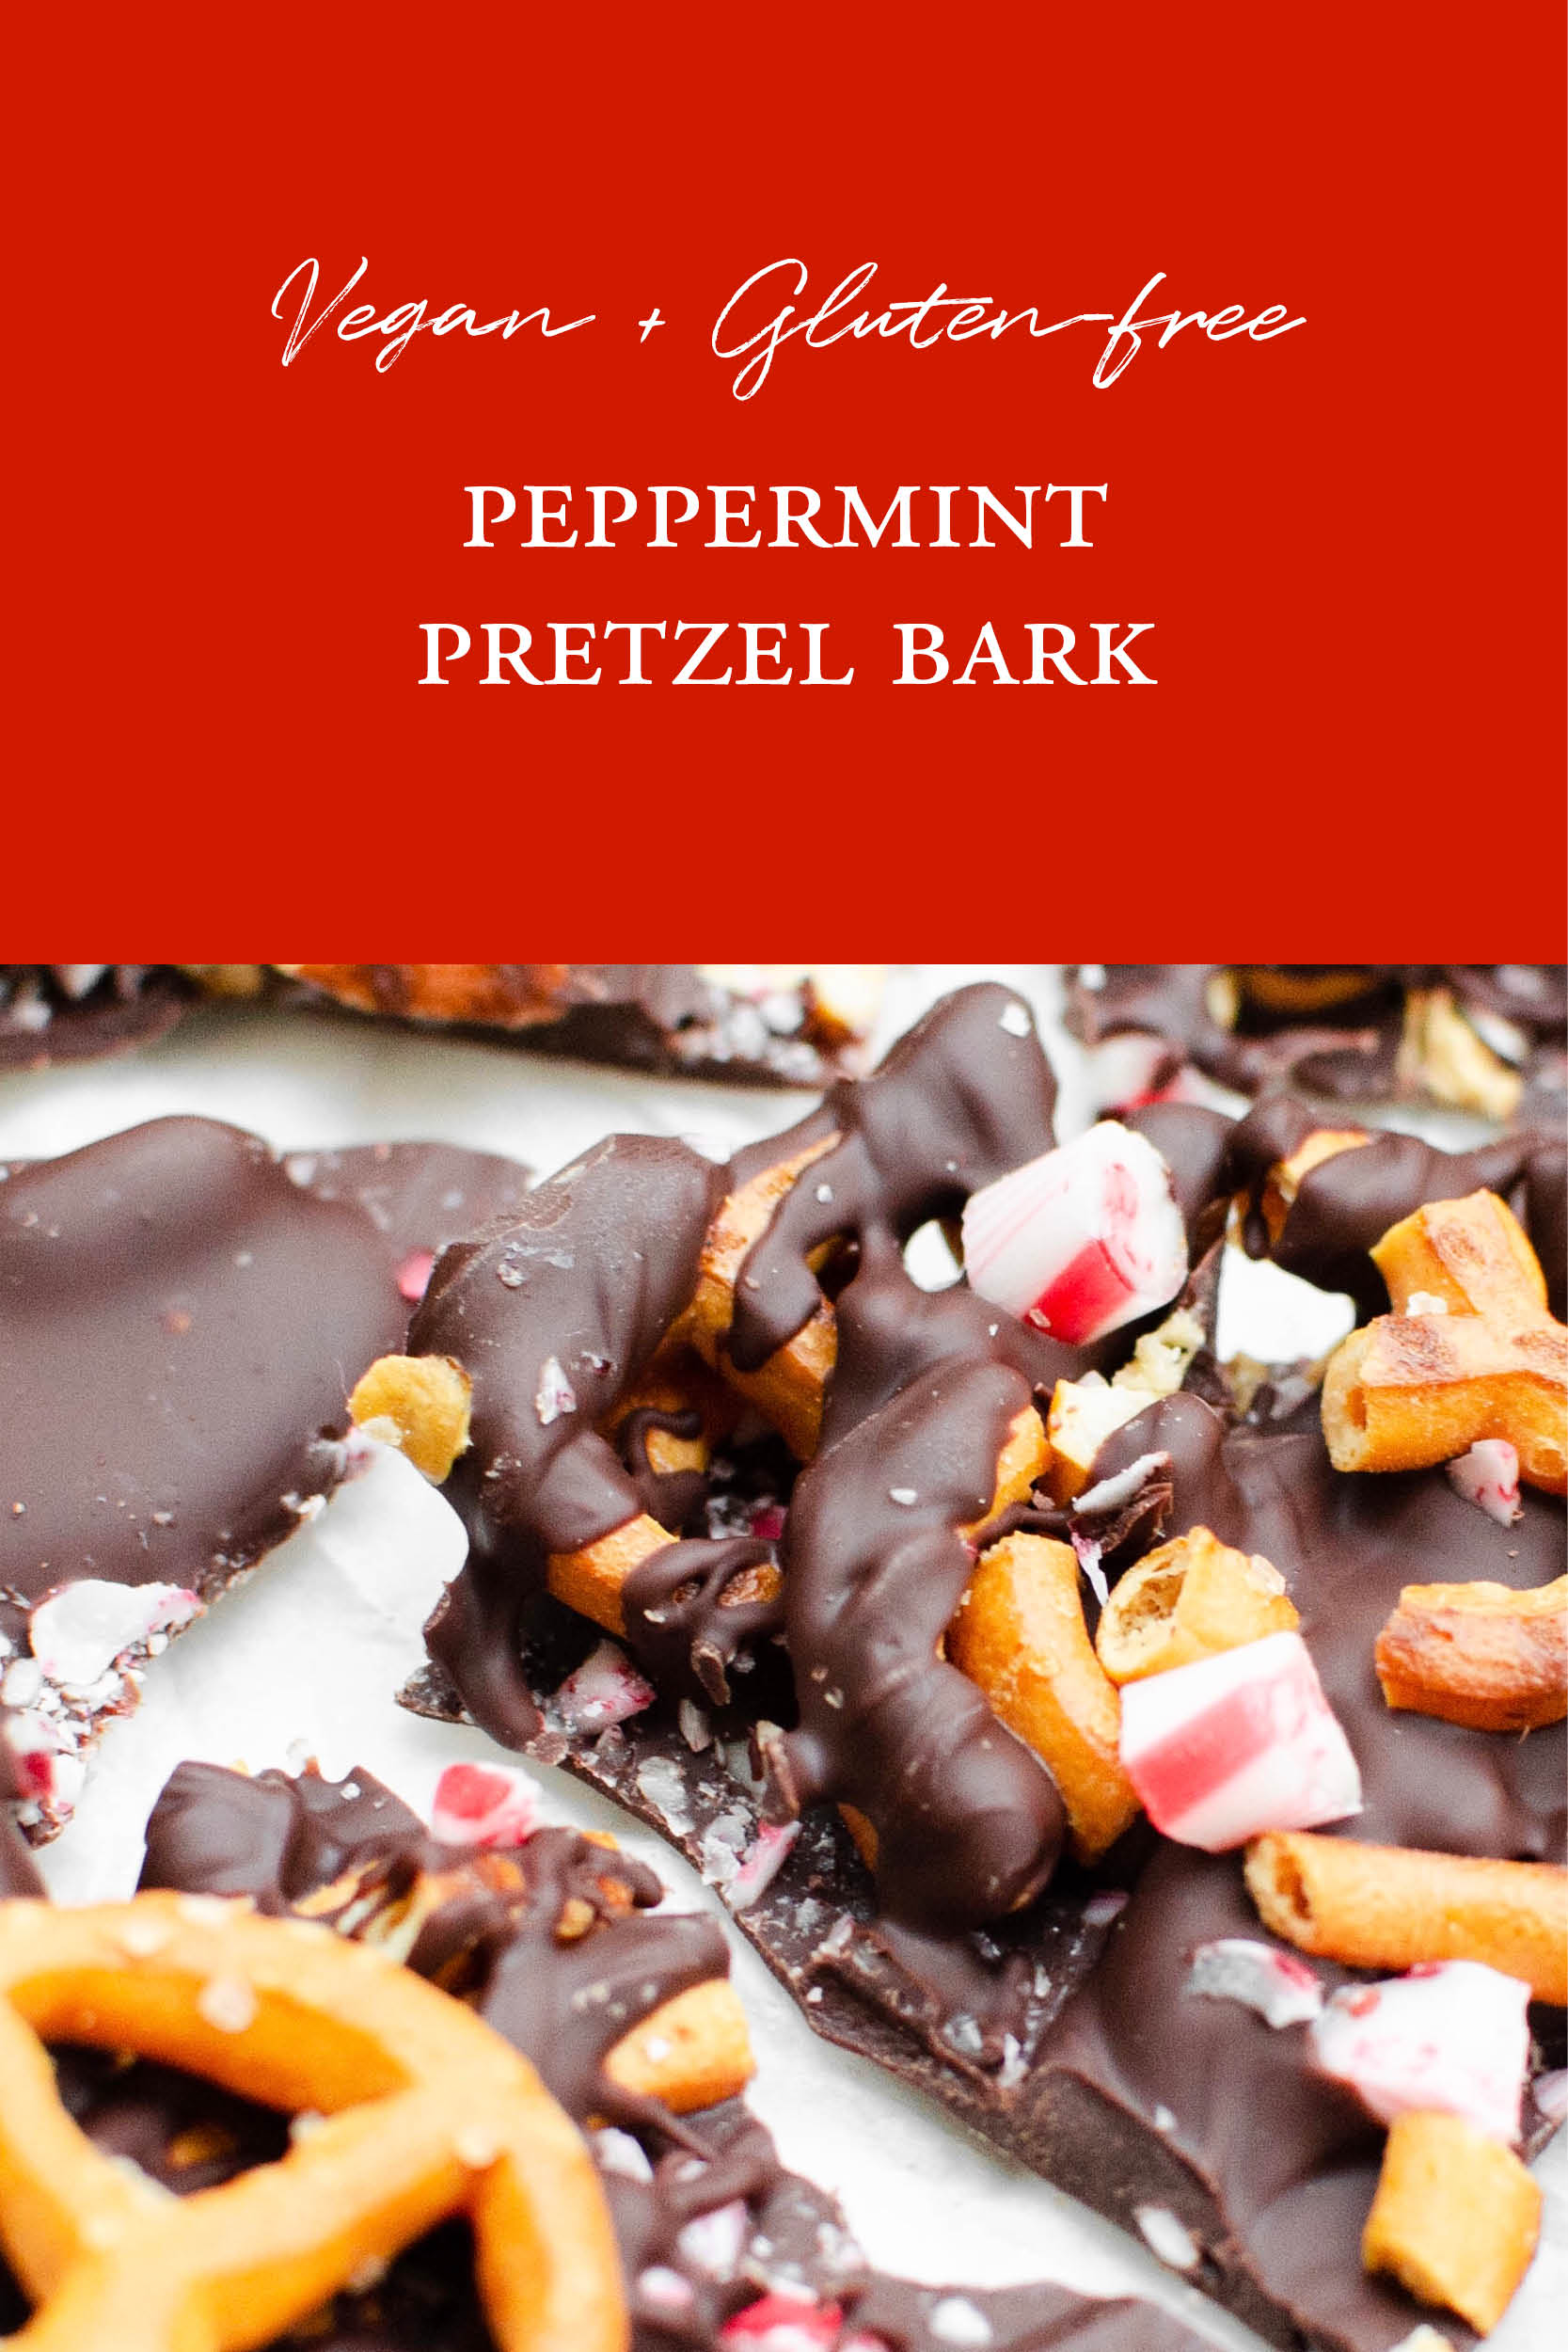 Peppermint Pretzel Bark - Vegan GF.jpg